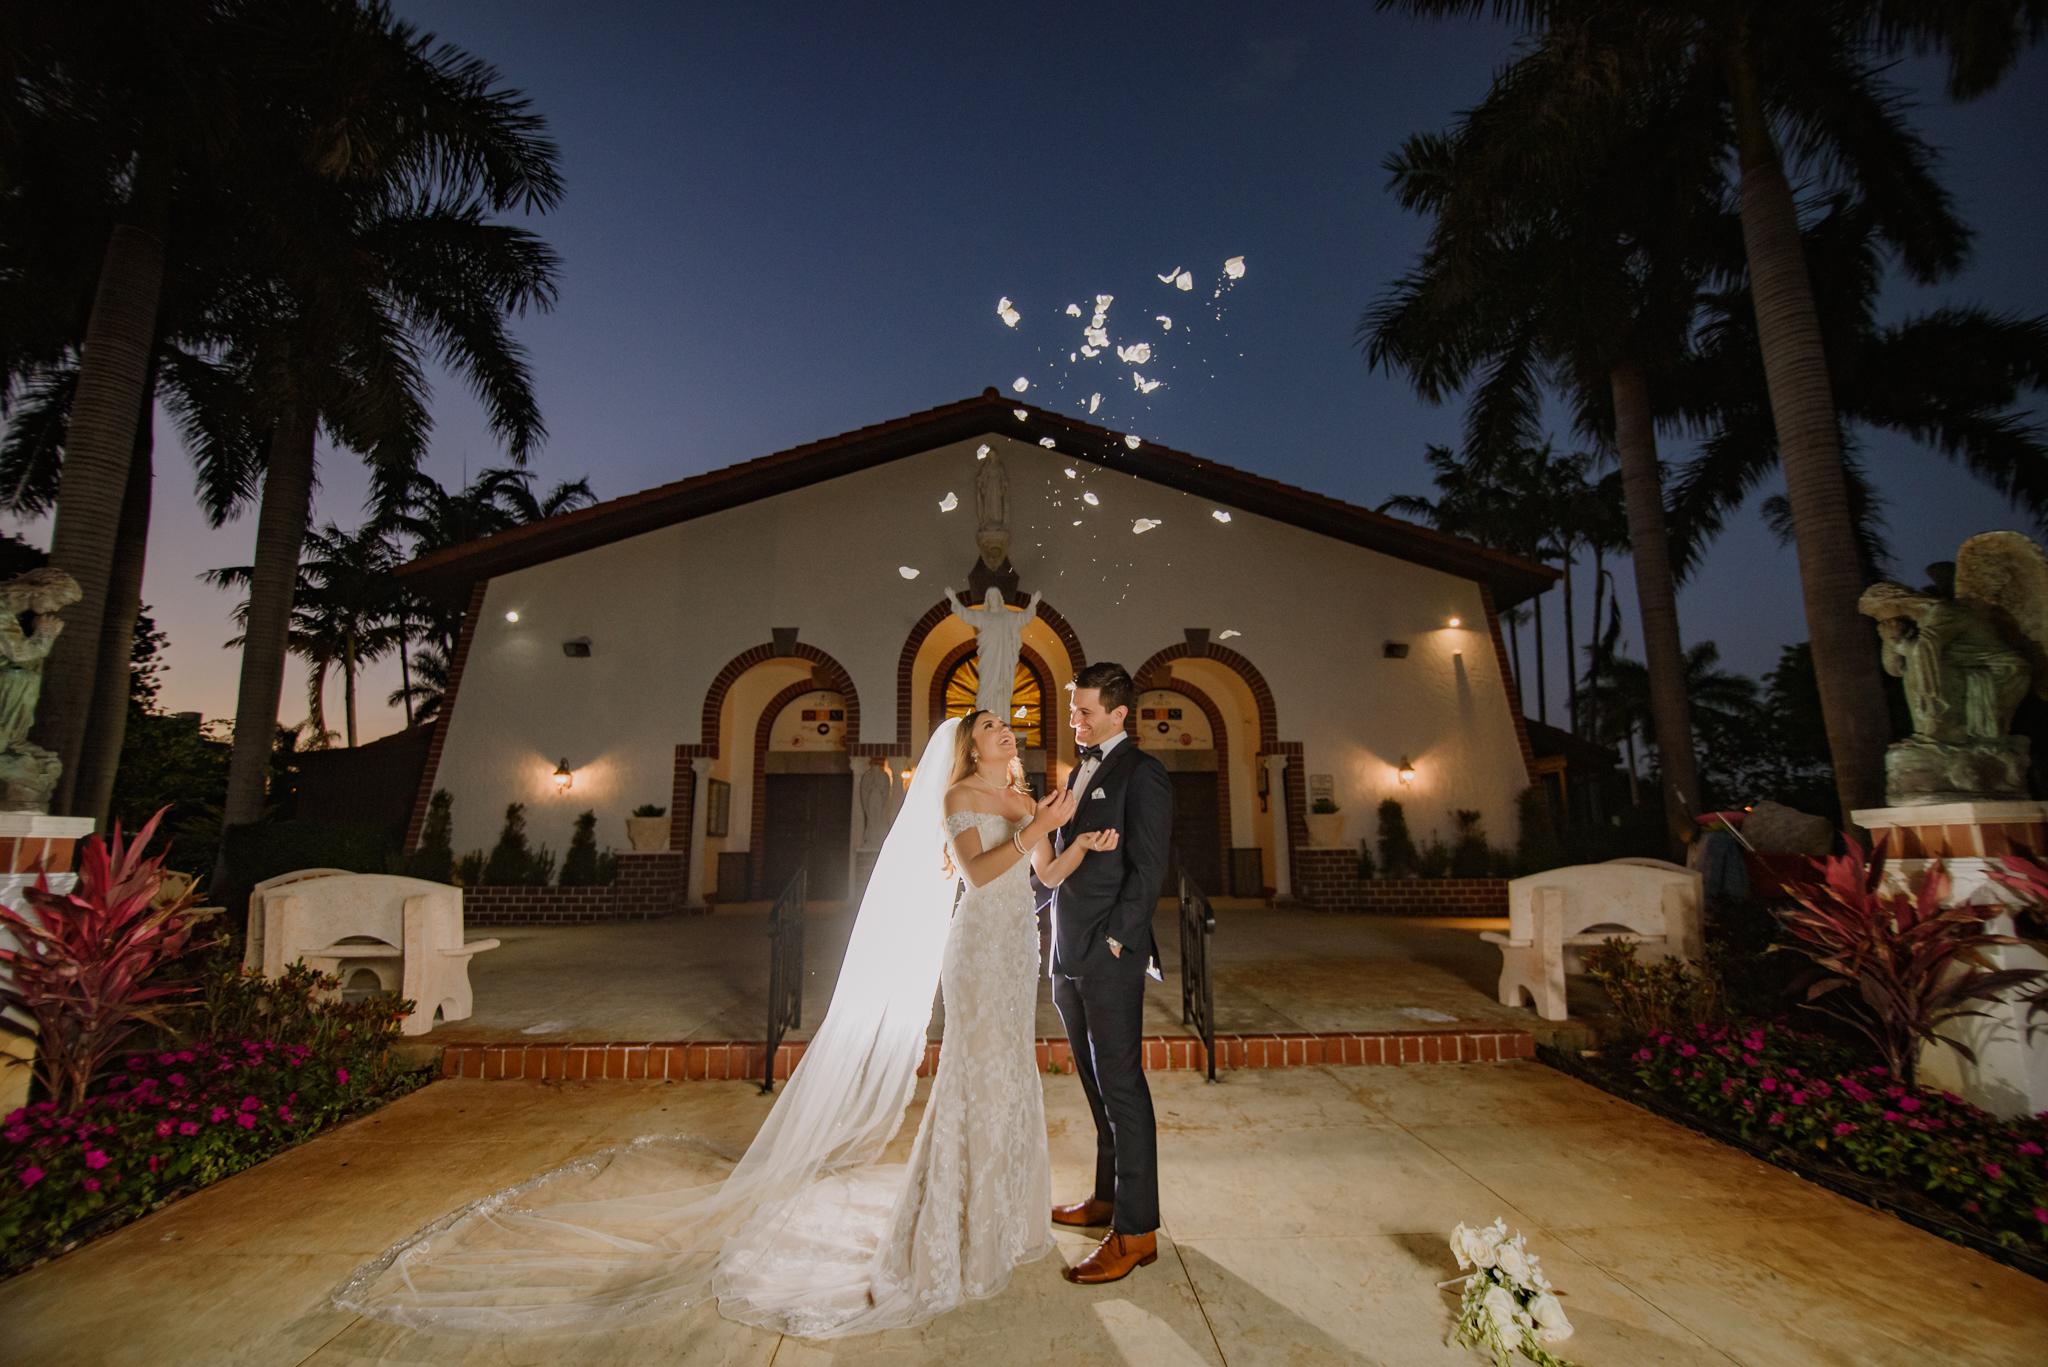 KELLEY + BLAKE ST RAYMOND CHURCH WEDDING:  LA JOLLA, CORAL GABLES, FLORIDA PHOTOGRAPHY